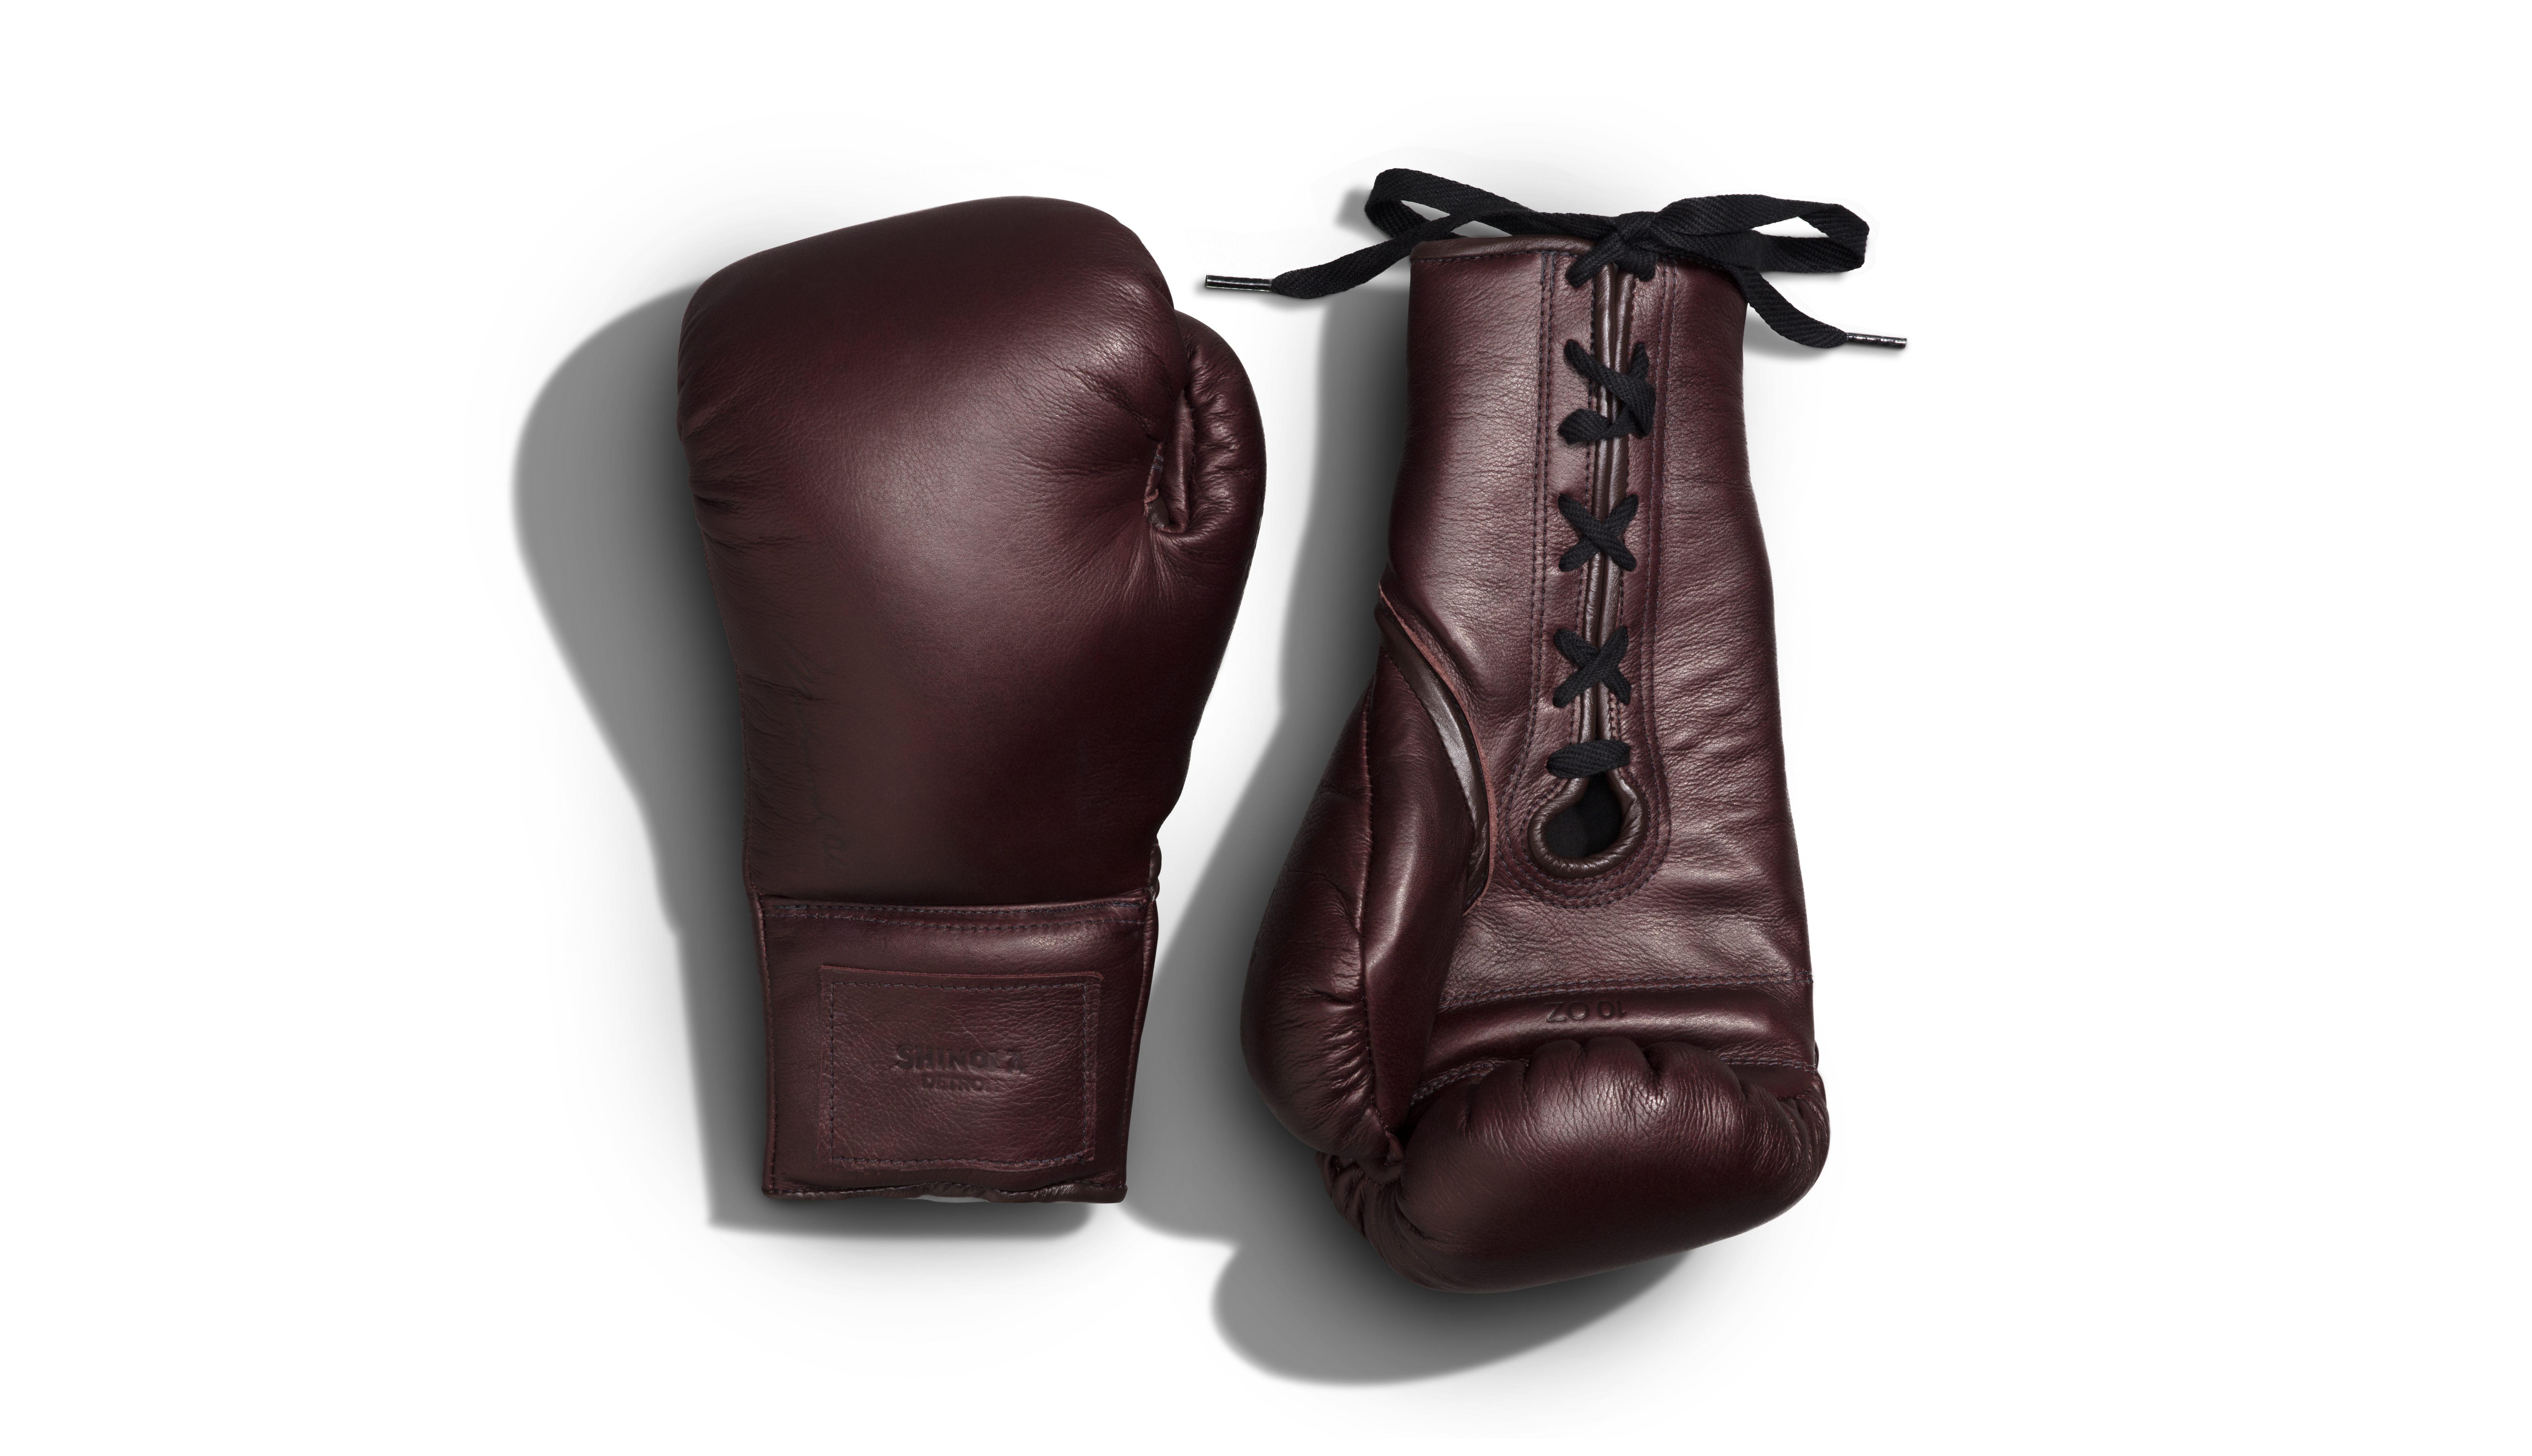 Muhammad Ali Boxing Glove.jpg